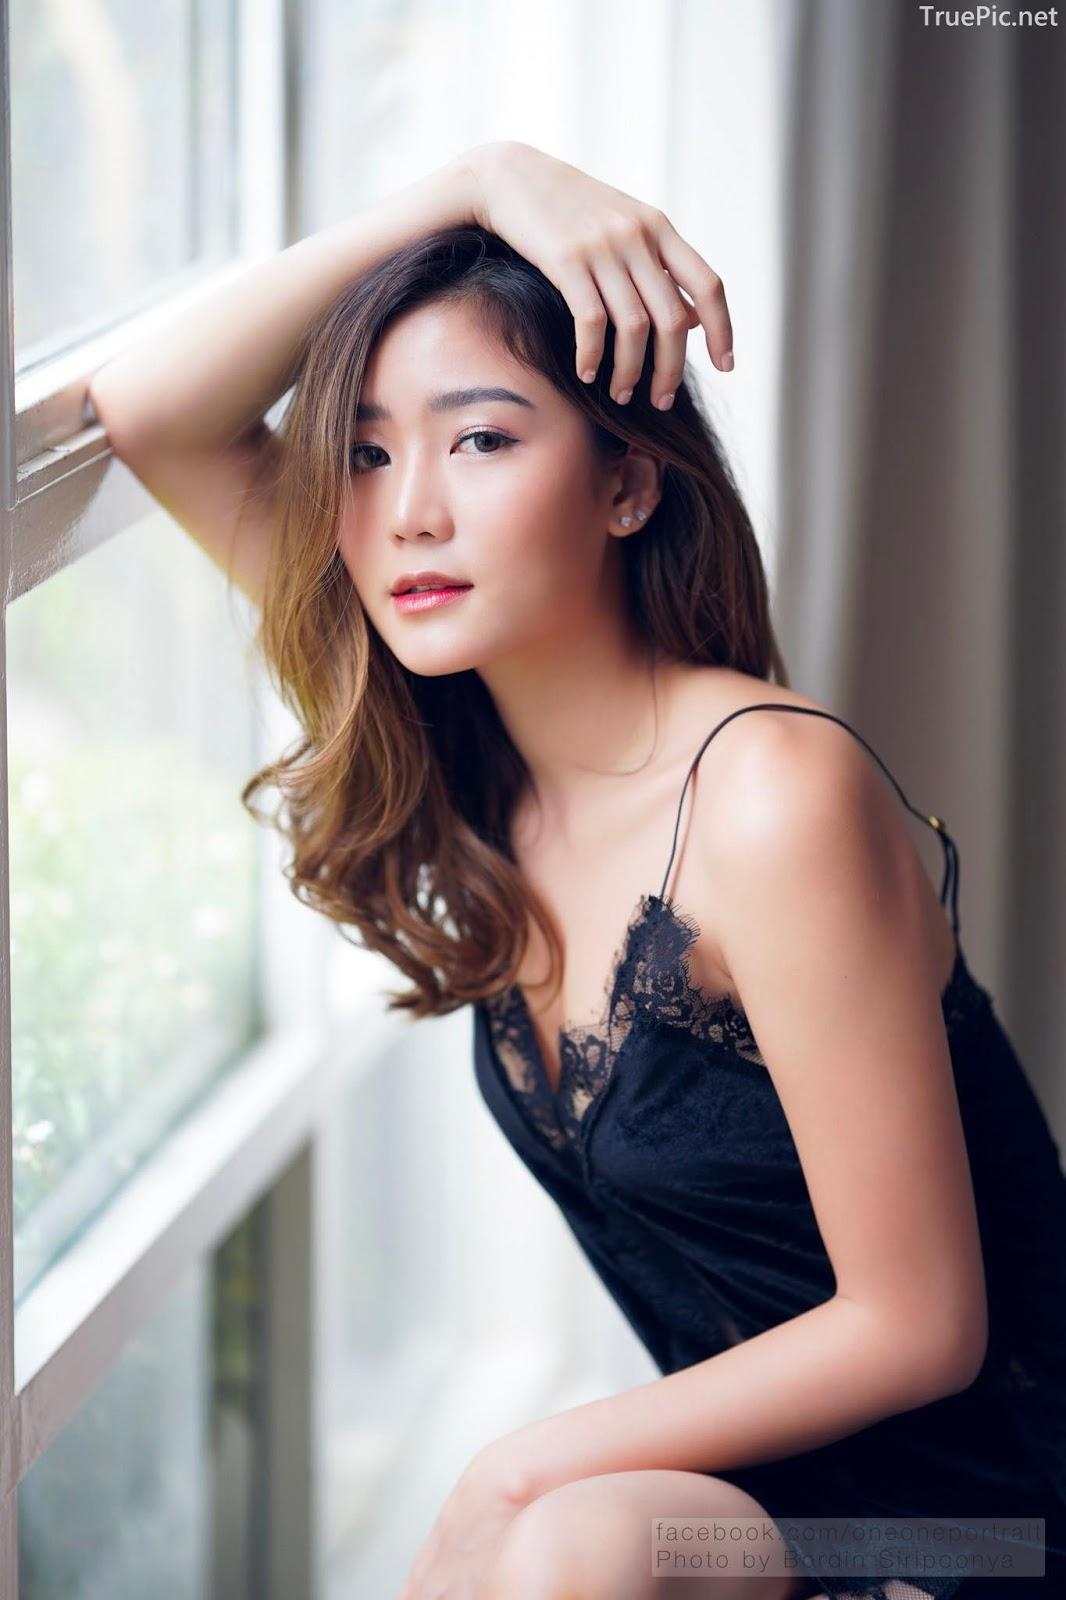 Thailand hot model Pattaravadee Boonmeesup vs Photo album Black Magic Sleepwear - Picture 4